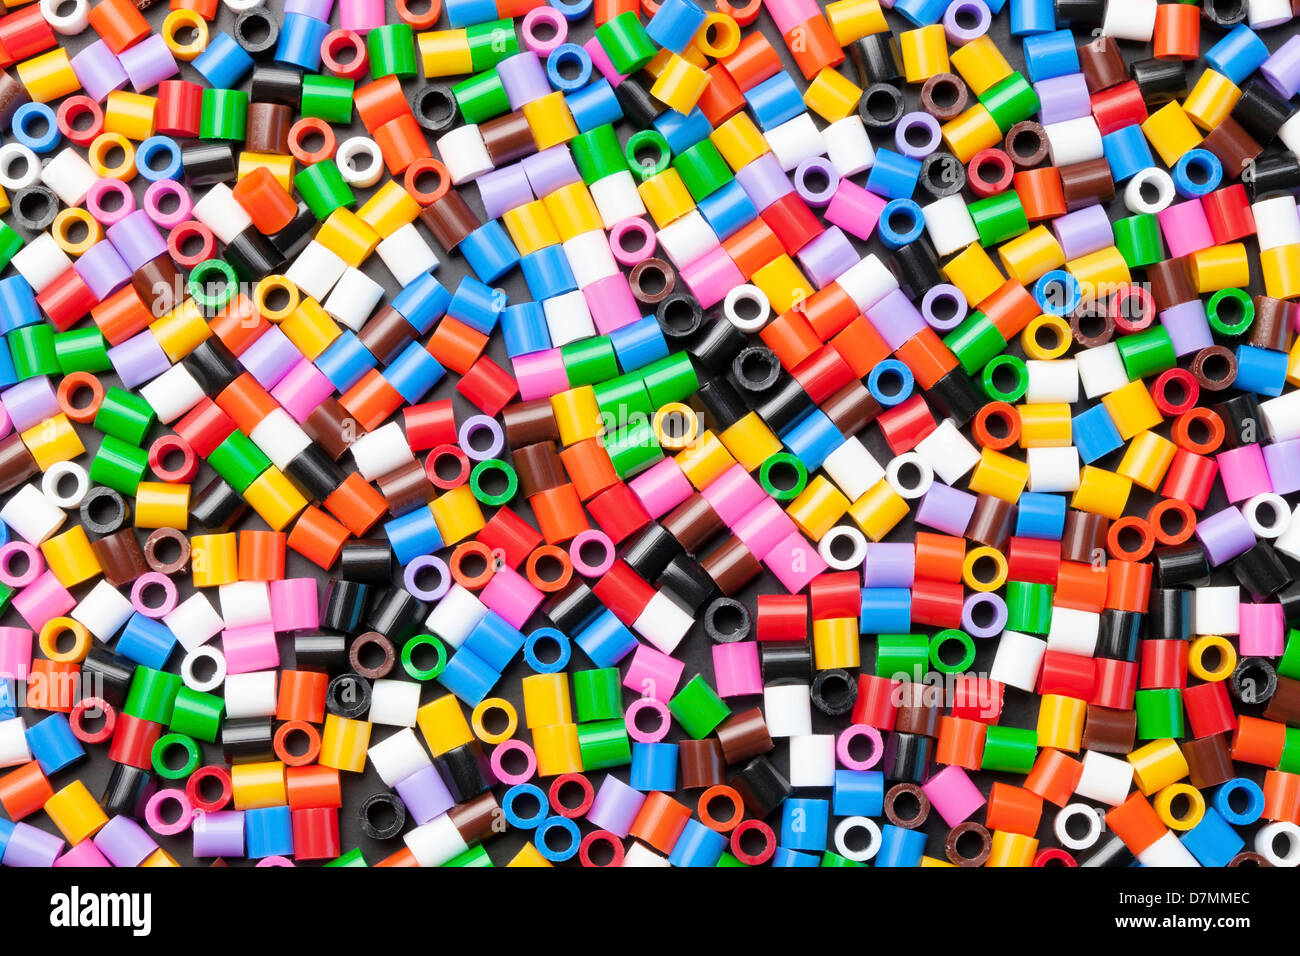 Plastic cylinders - Stock Image